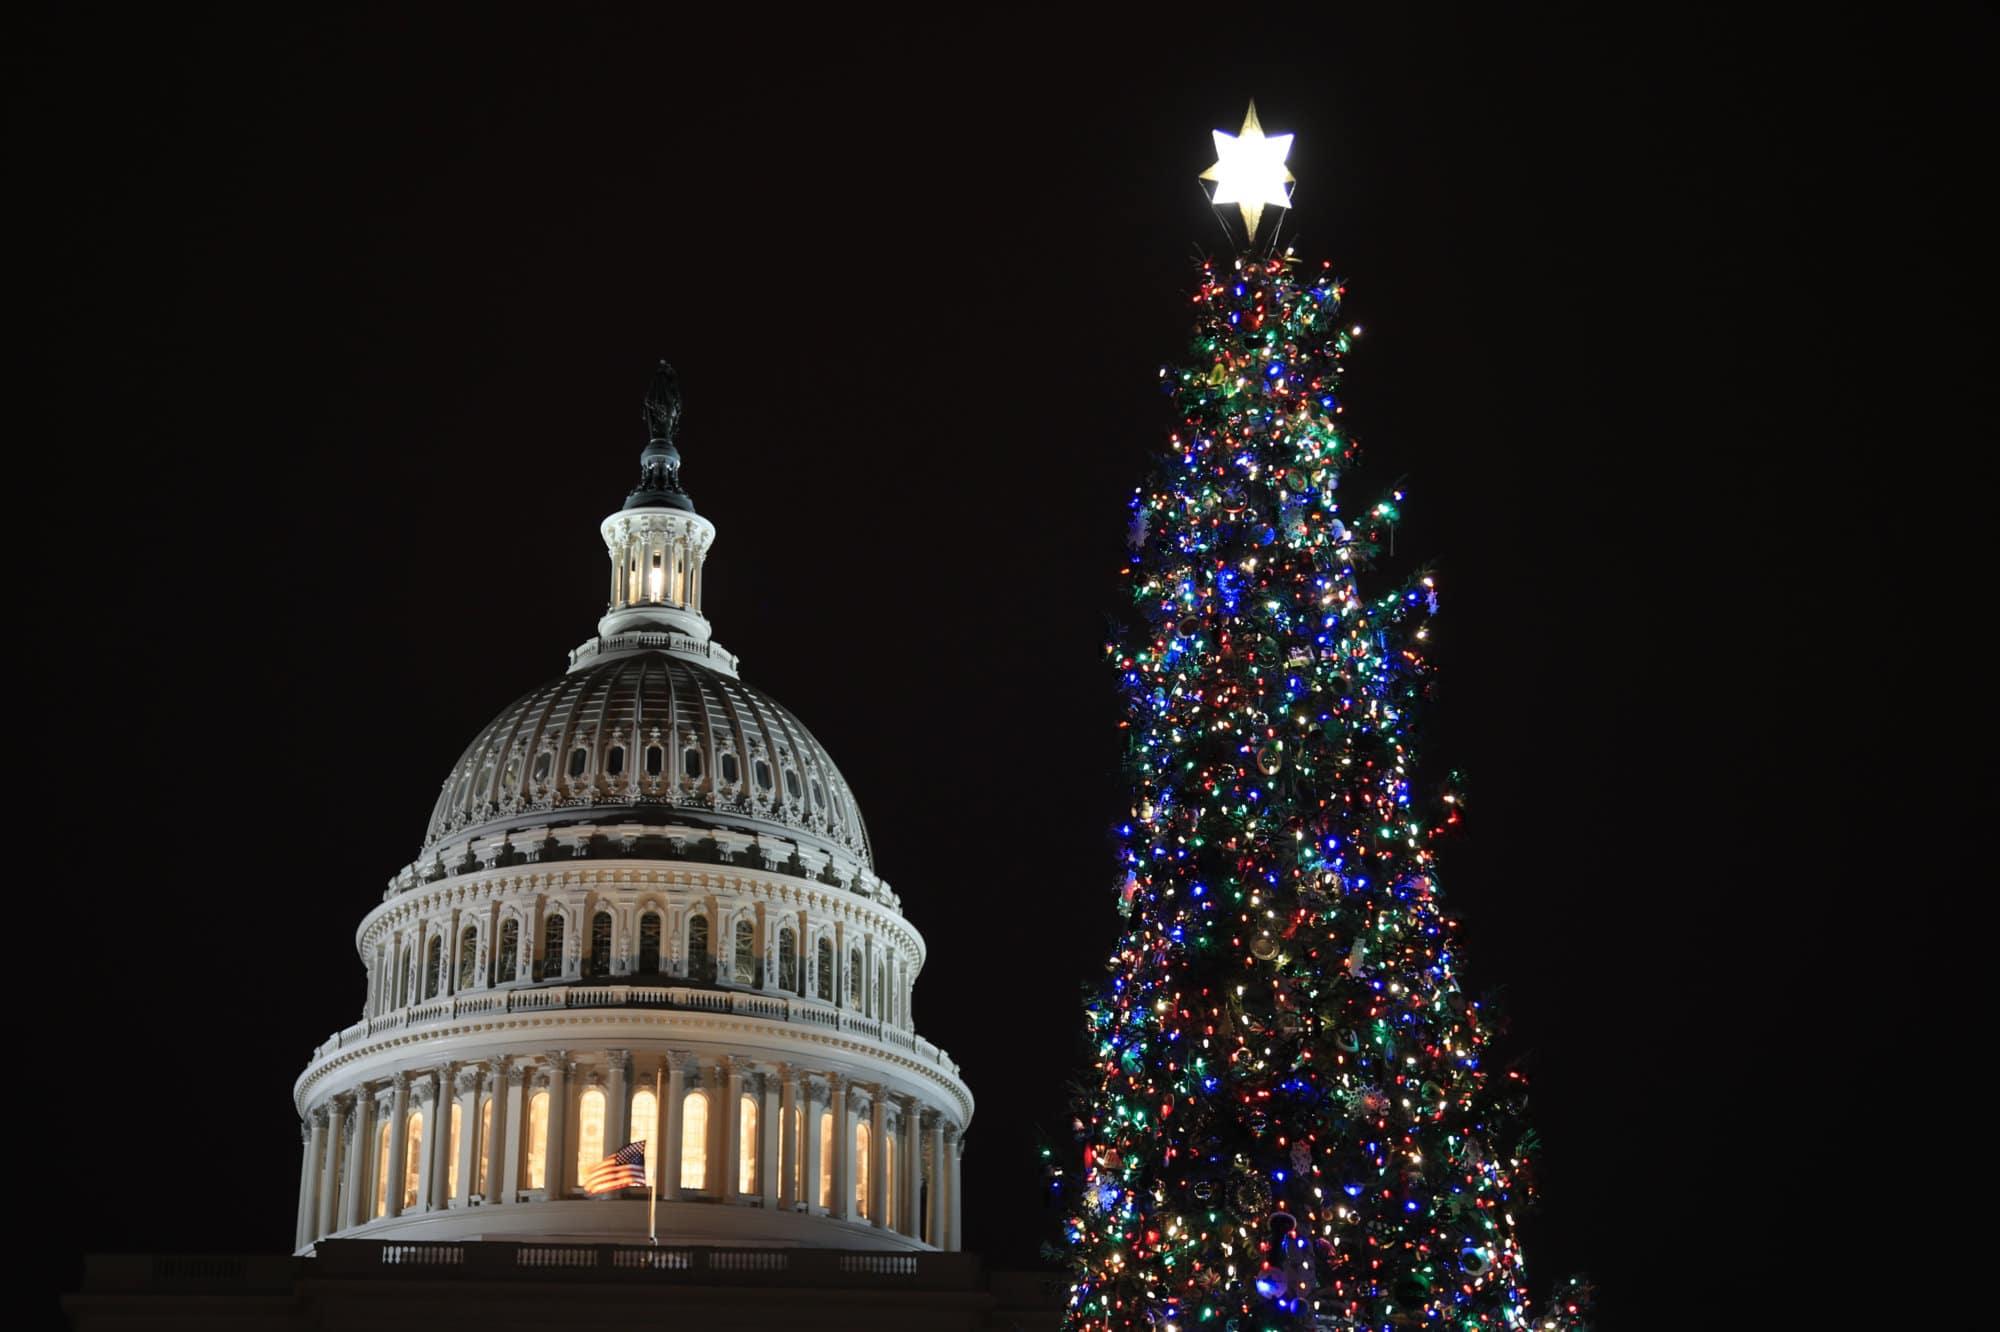 PHOTOS: 2018 US Capitol Christmas Tree Lighting